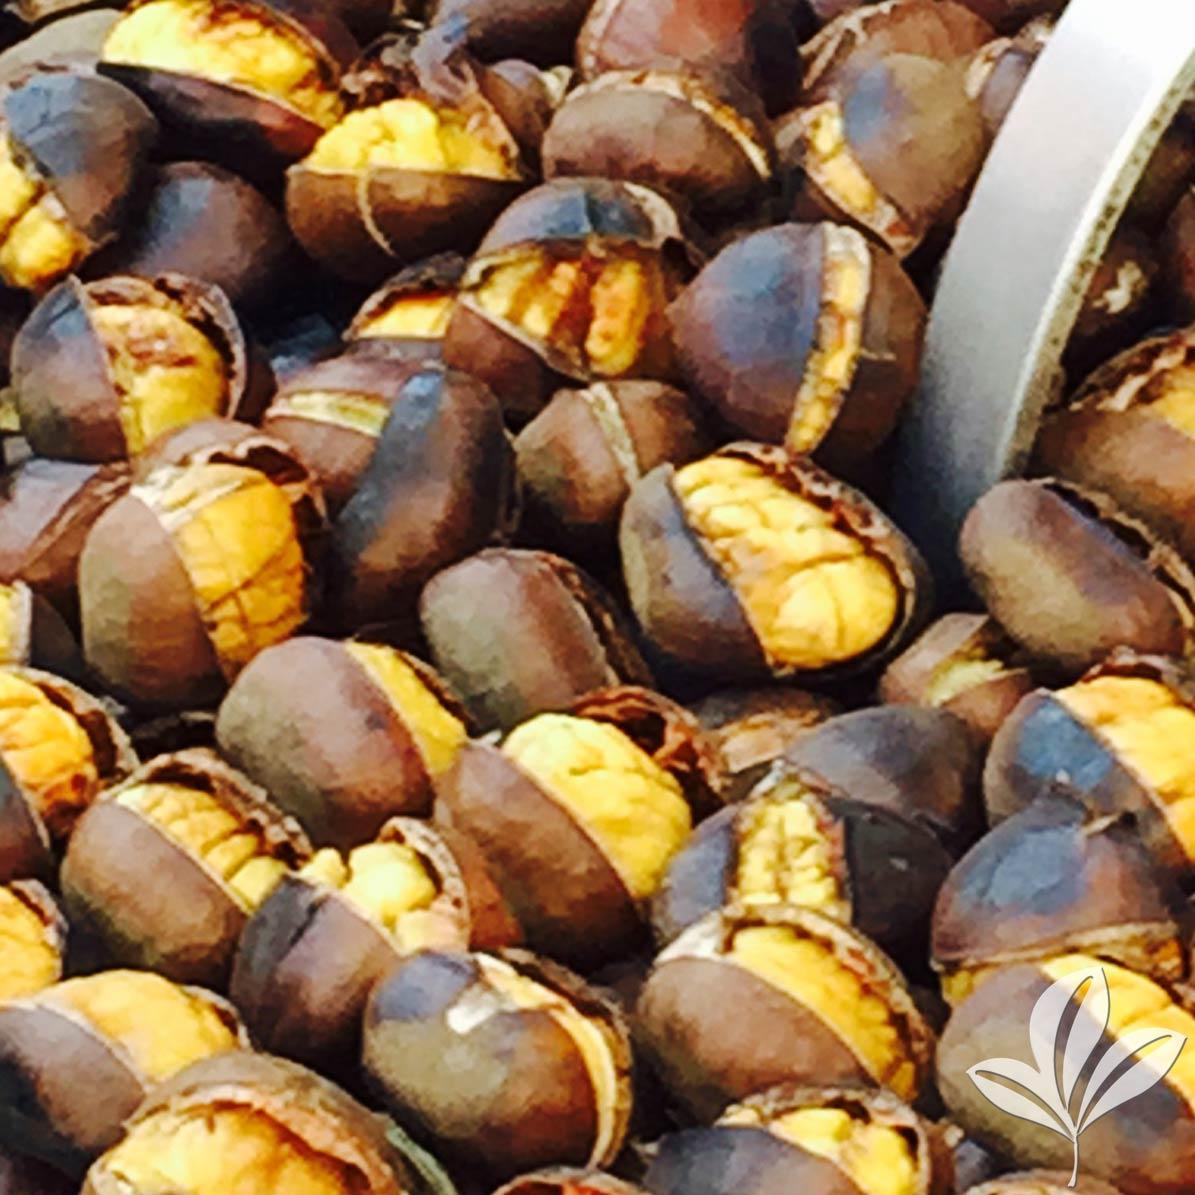 chestnut-cropped2.jpg